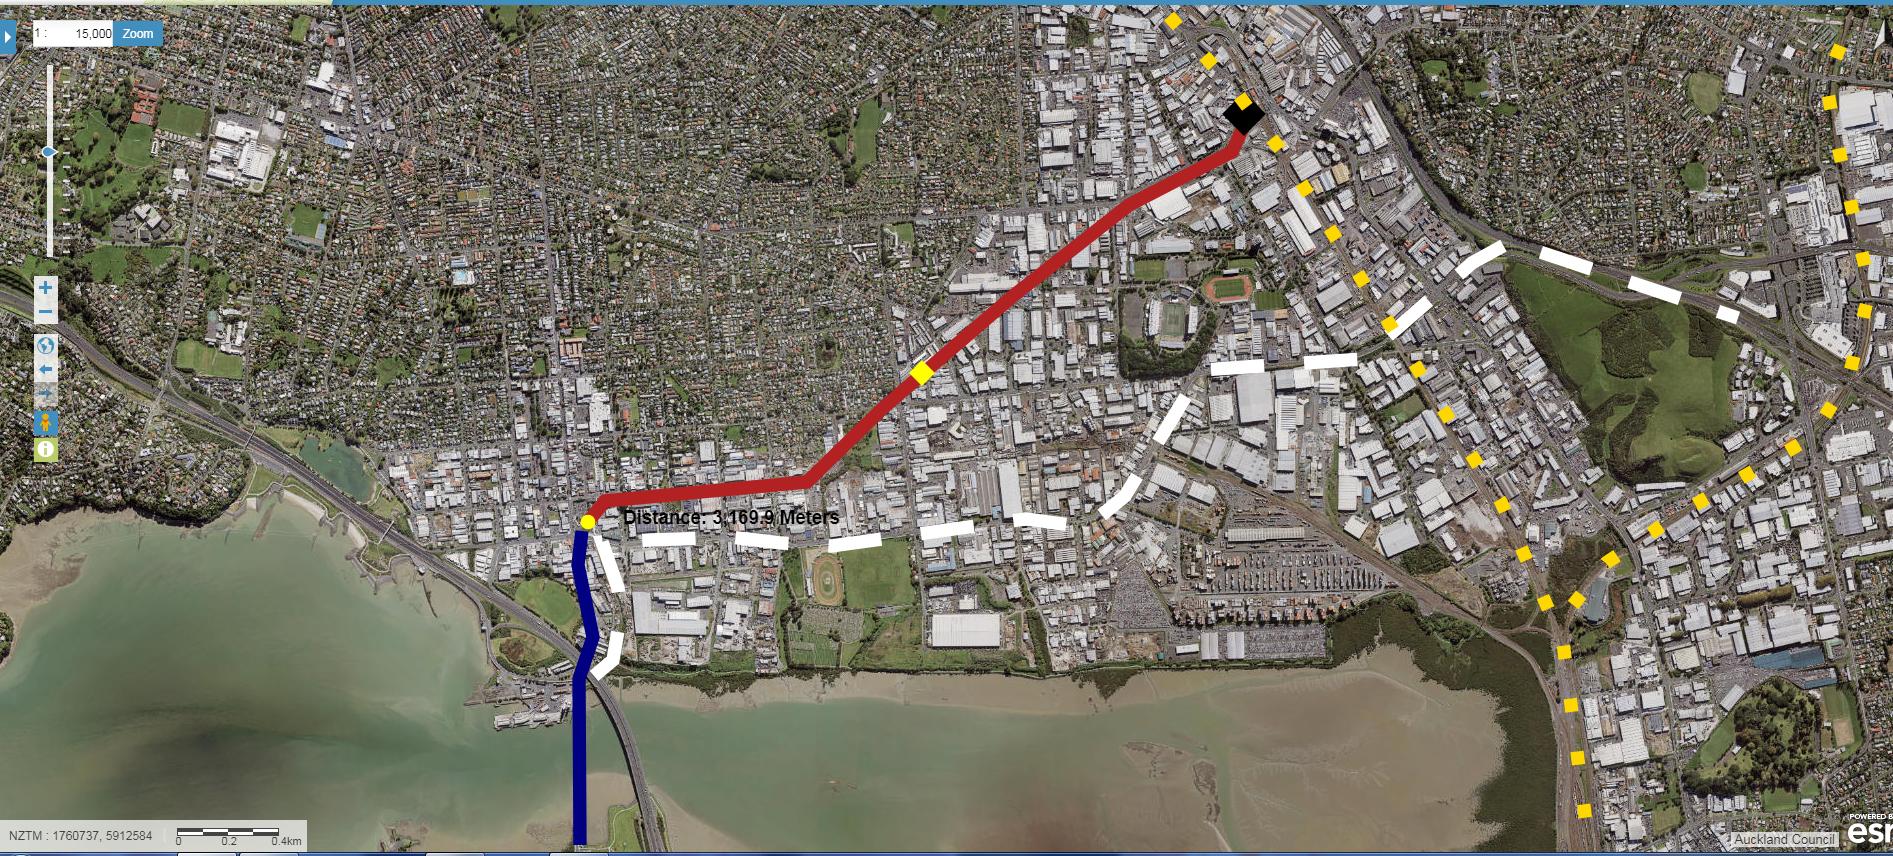 Converting the Onehunga Line to Light Rail – Extending Reach of both Heavy Rail and Light Rail!